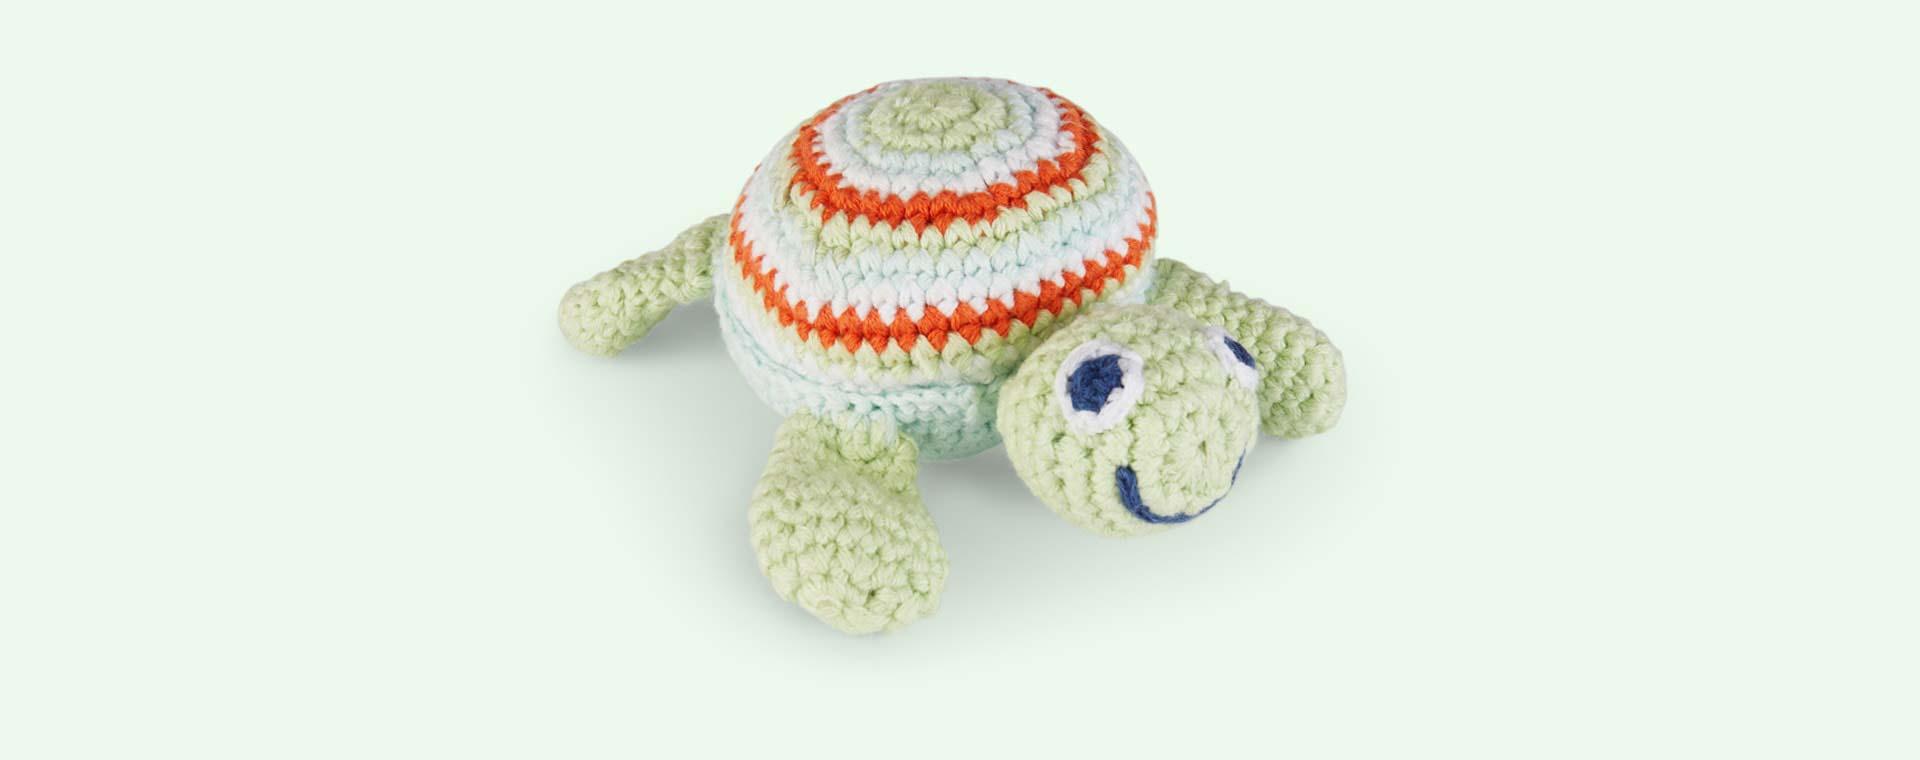 Green Pebble Turtle Crochet Rattle